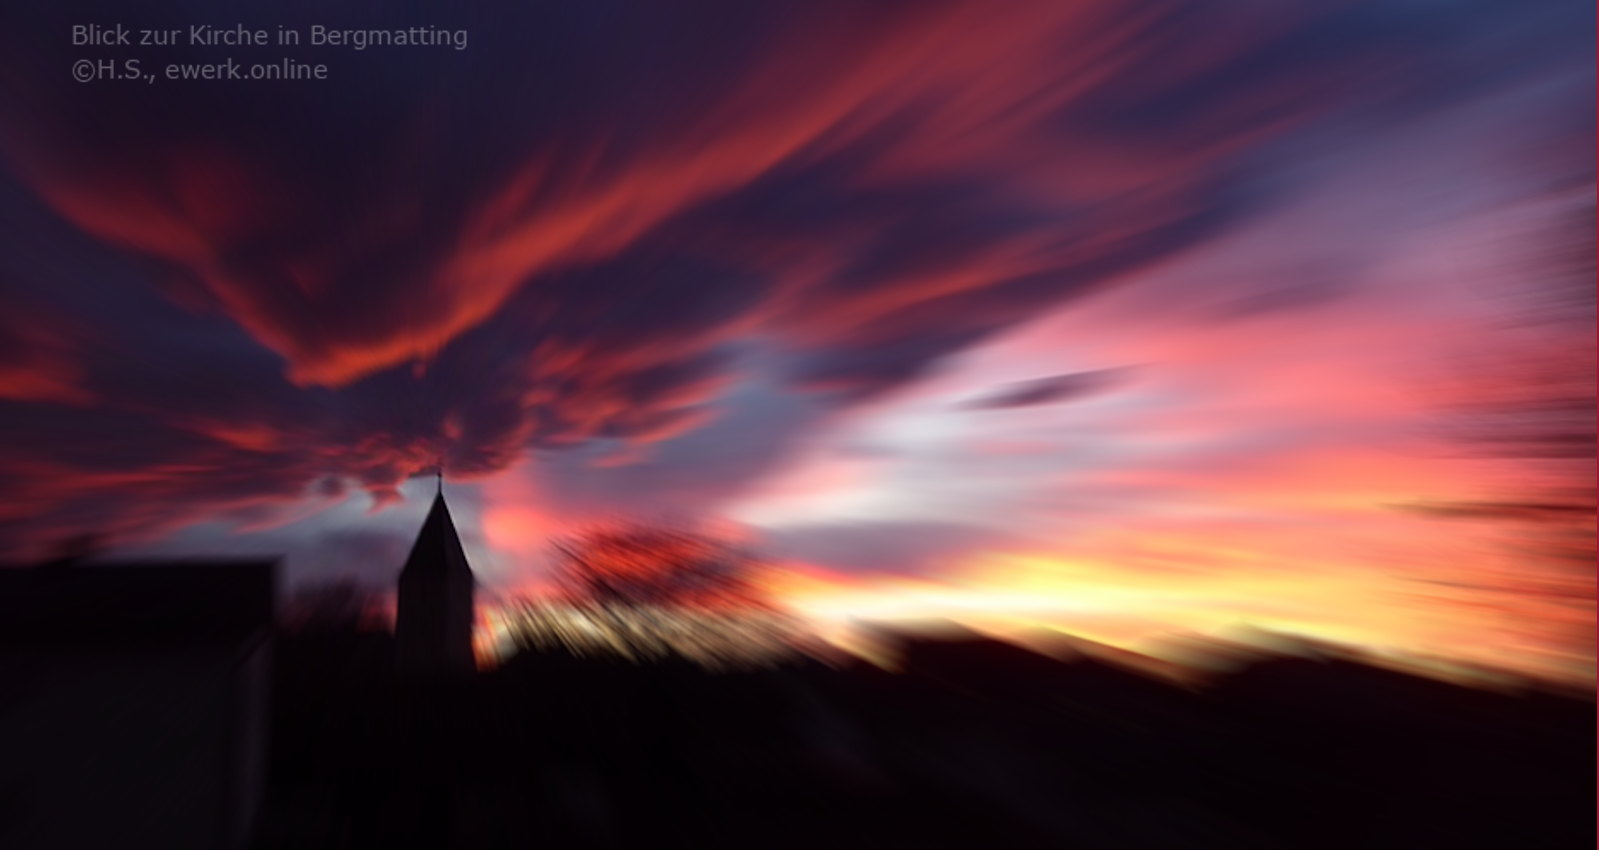 Foto: Kirche in Bermatting, Bayern